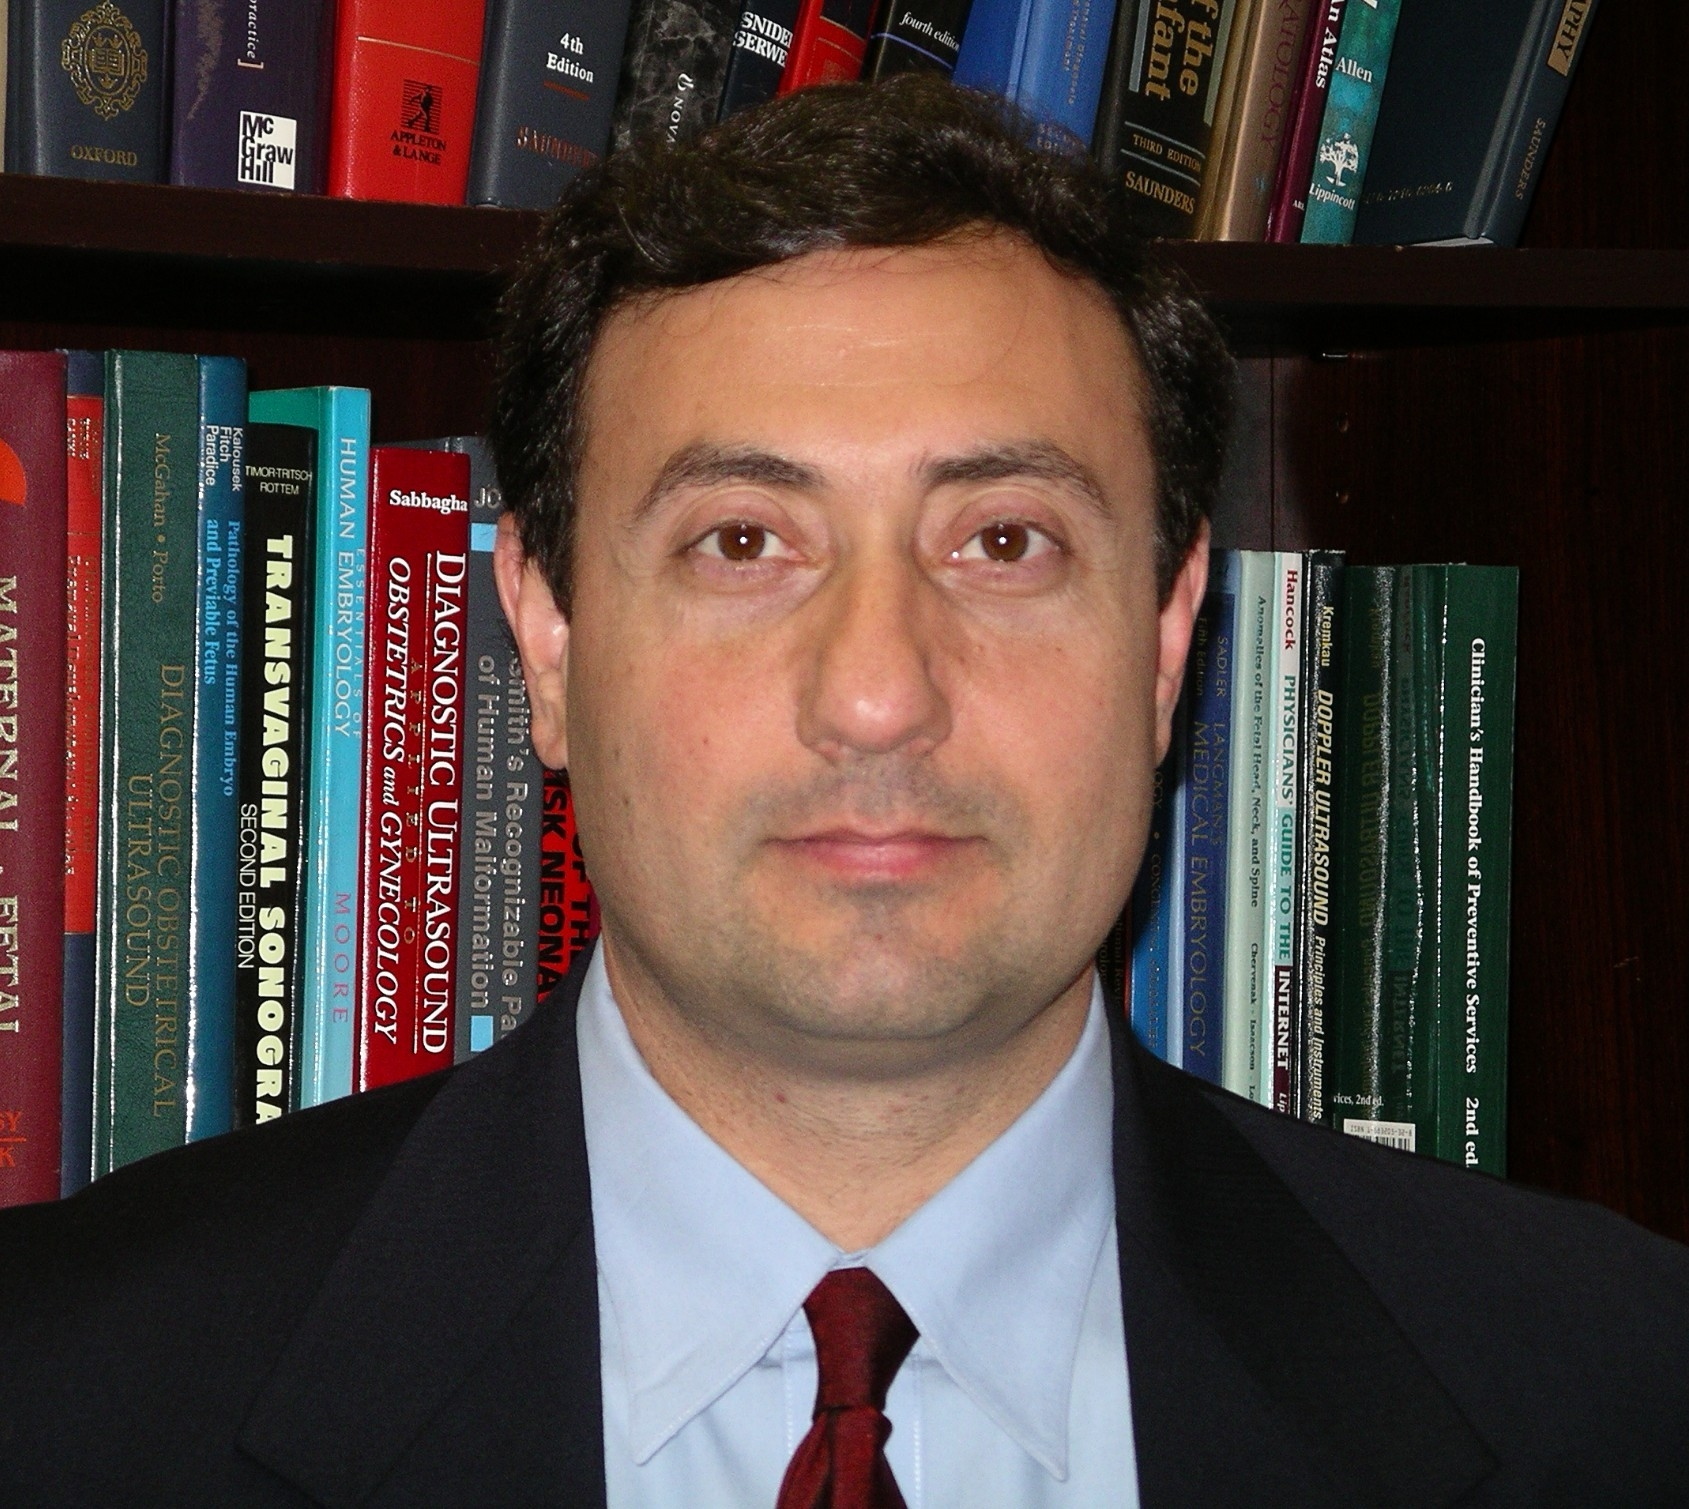 Congress Faculty Bios | World Congress on Ultrasound in